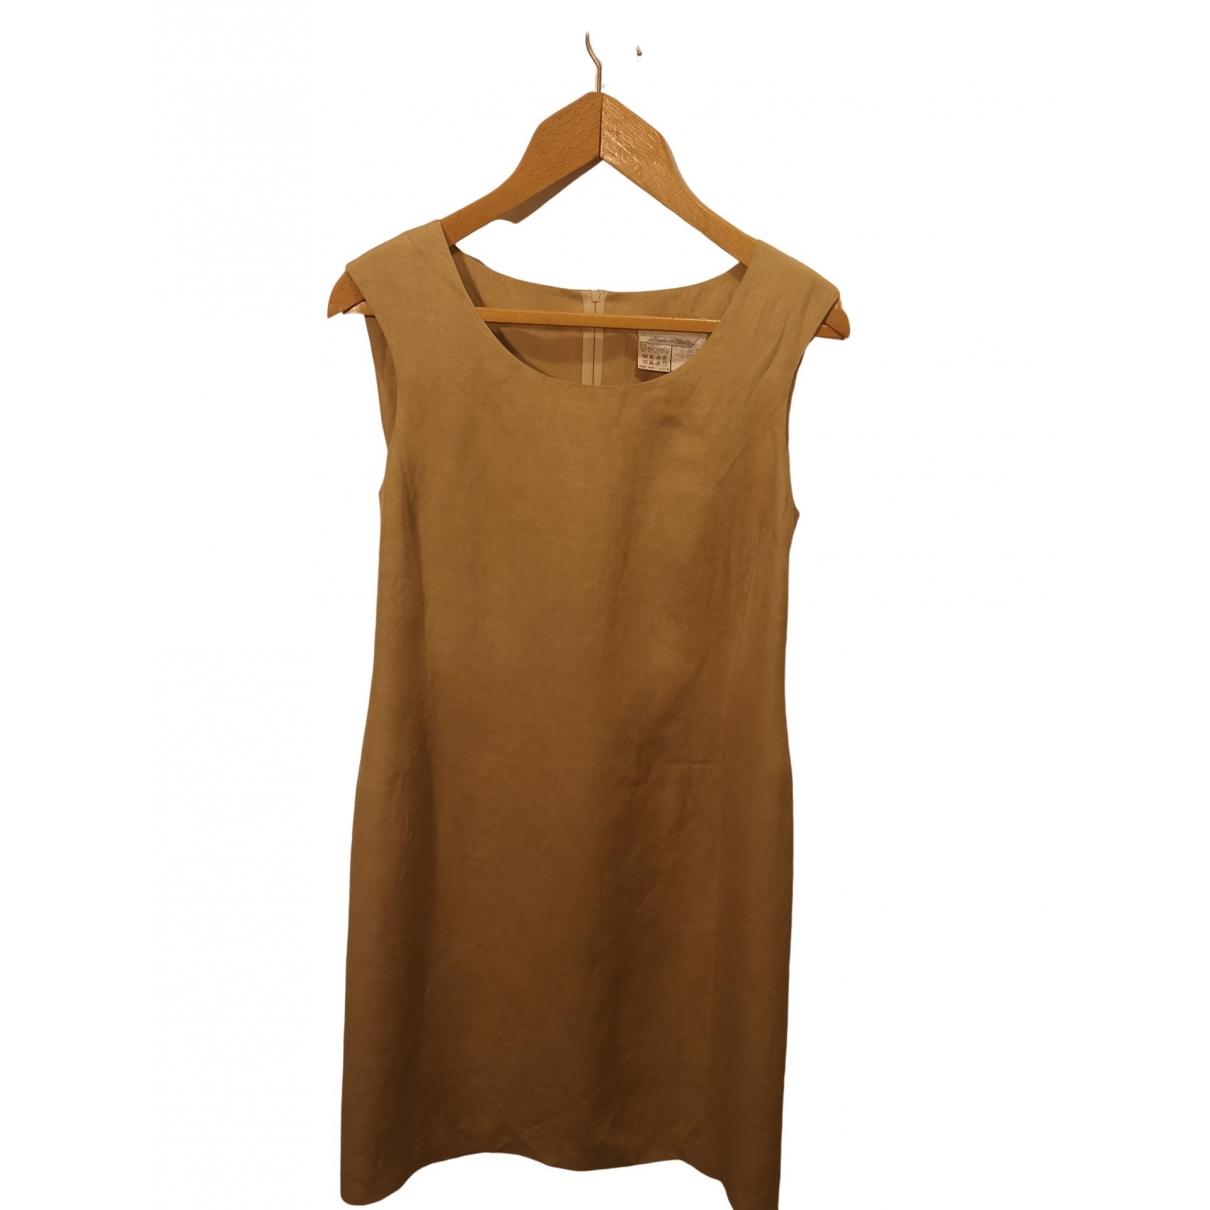 Max Mara \N Beige Cotton dress for Women 42 FR